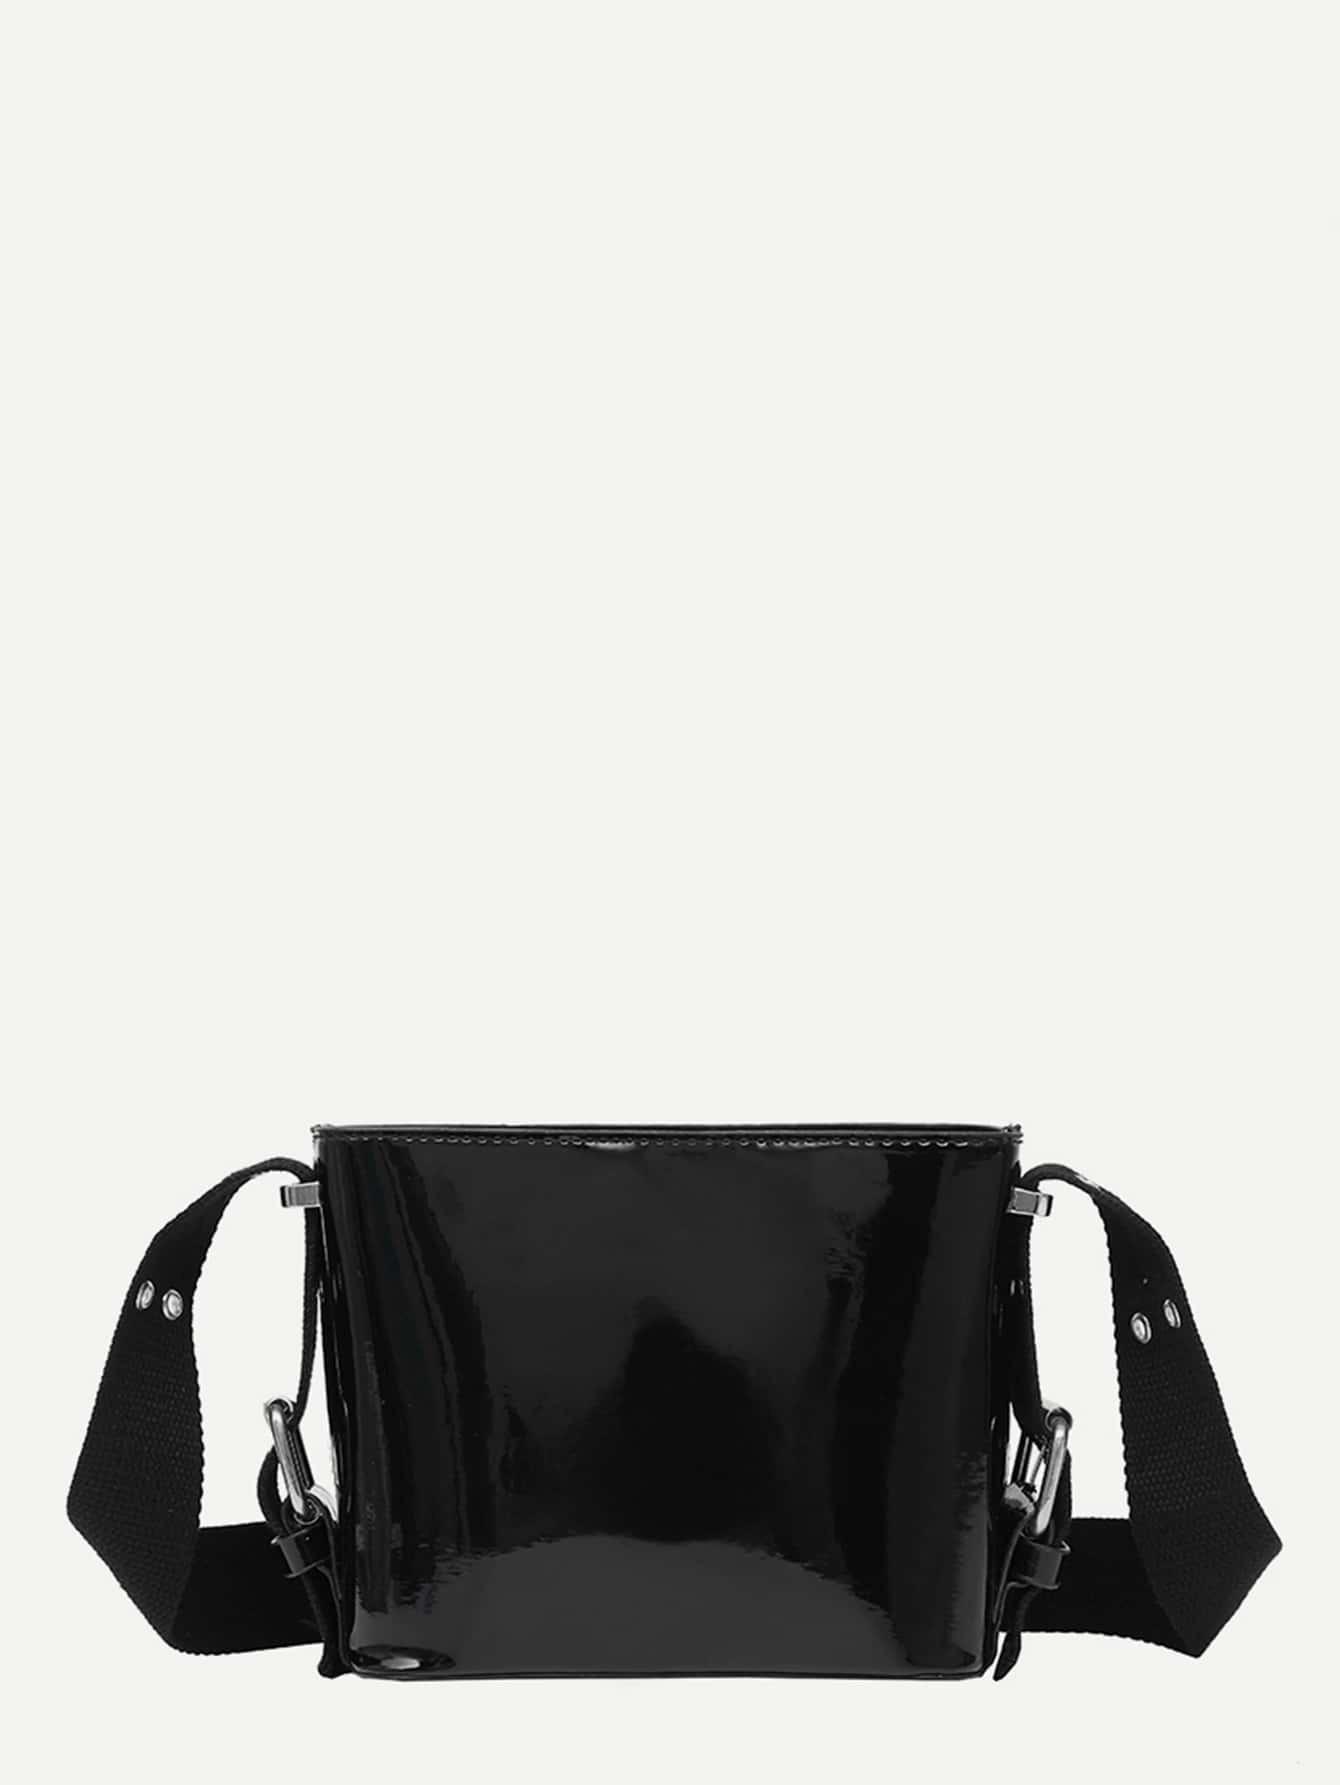 Grommet Detail Strap PU Crossbody Bag contrast pu grommet detail dress with necklace